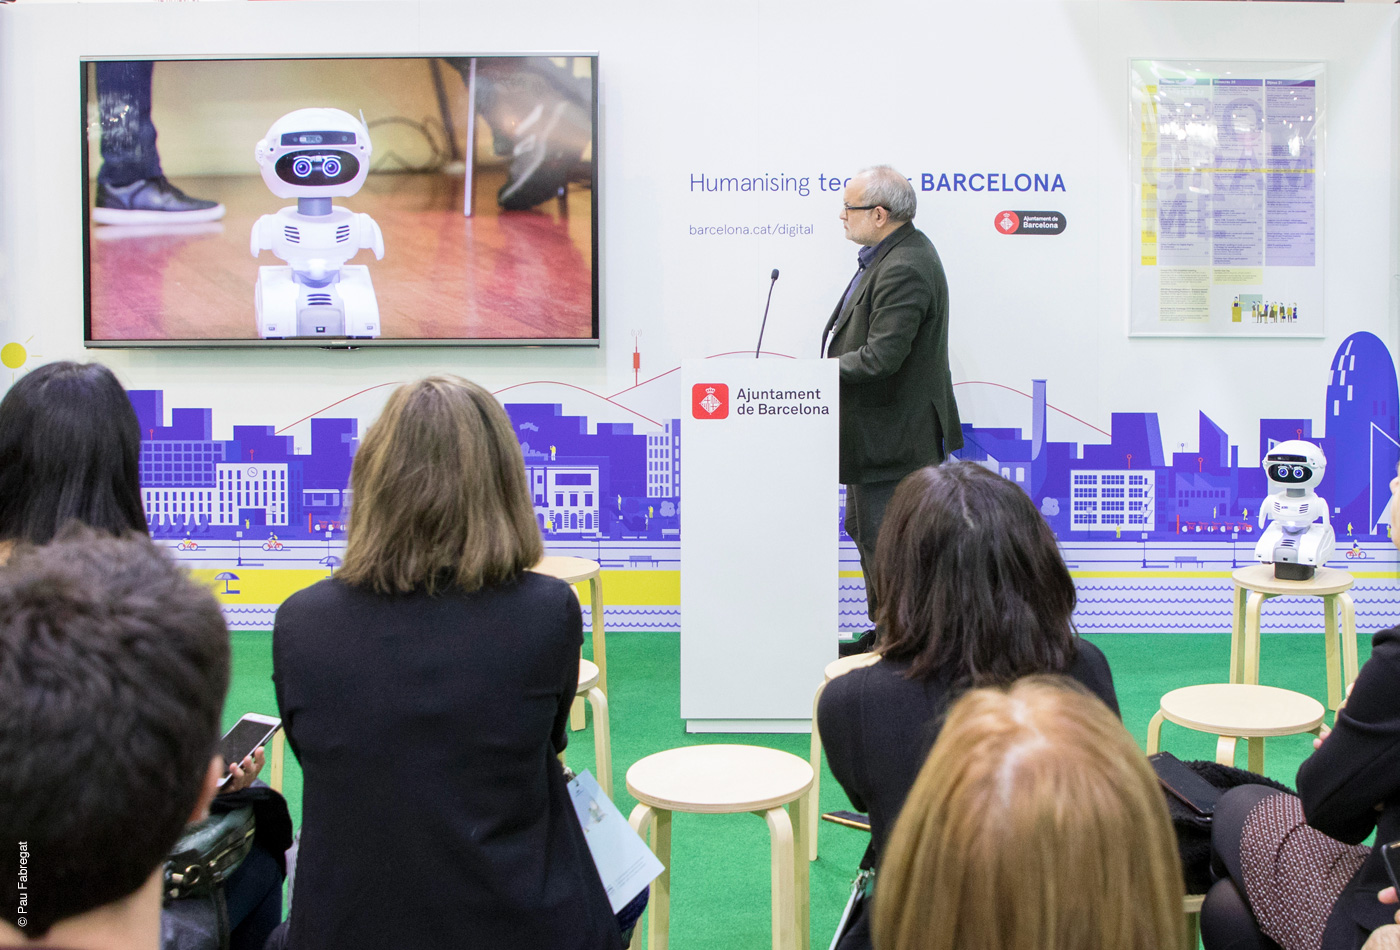 smartcity-barcelona-congress-expo-stand-ajuntament-barcelona